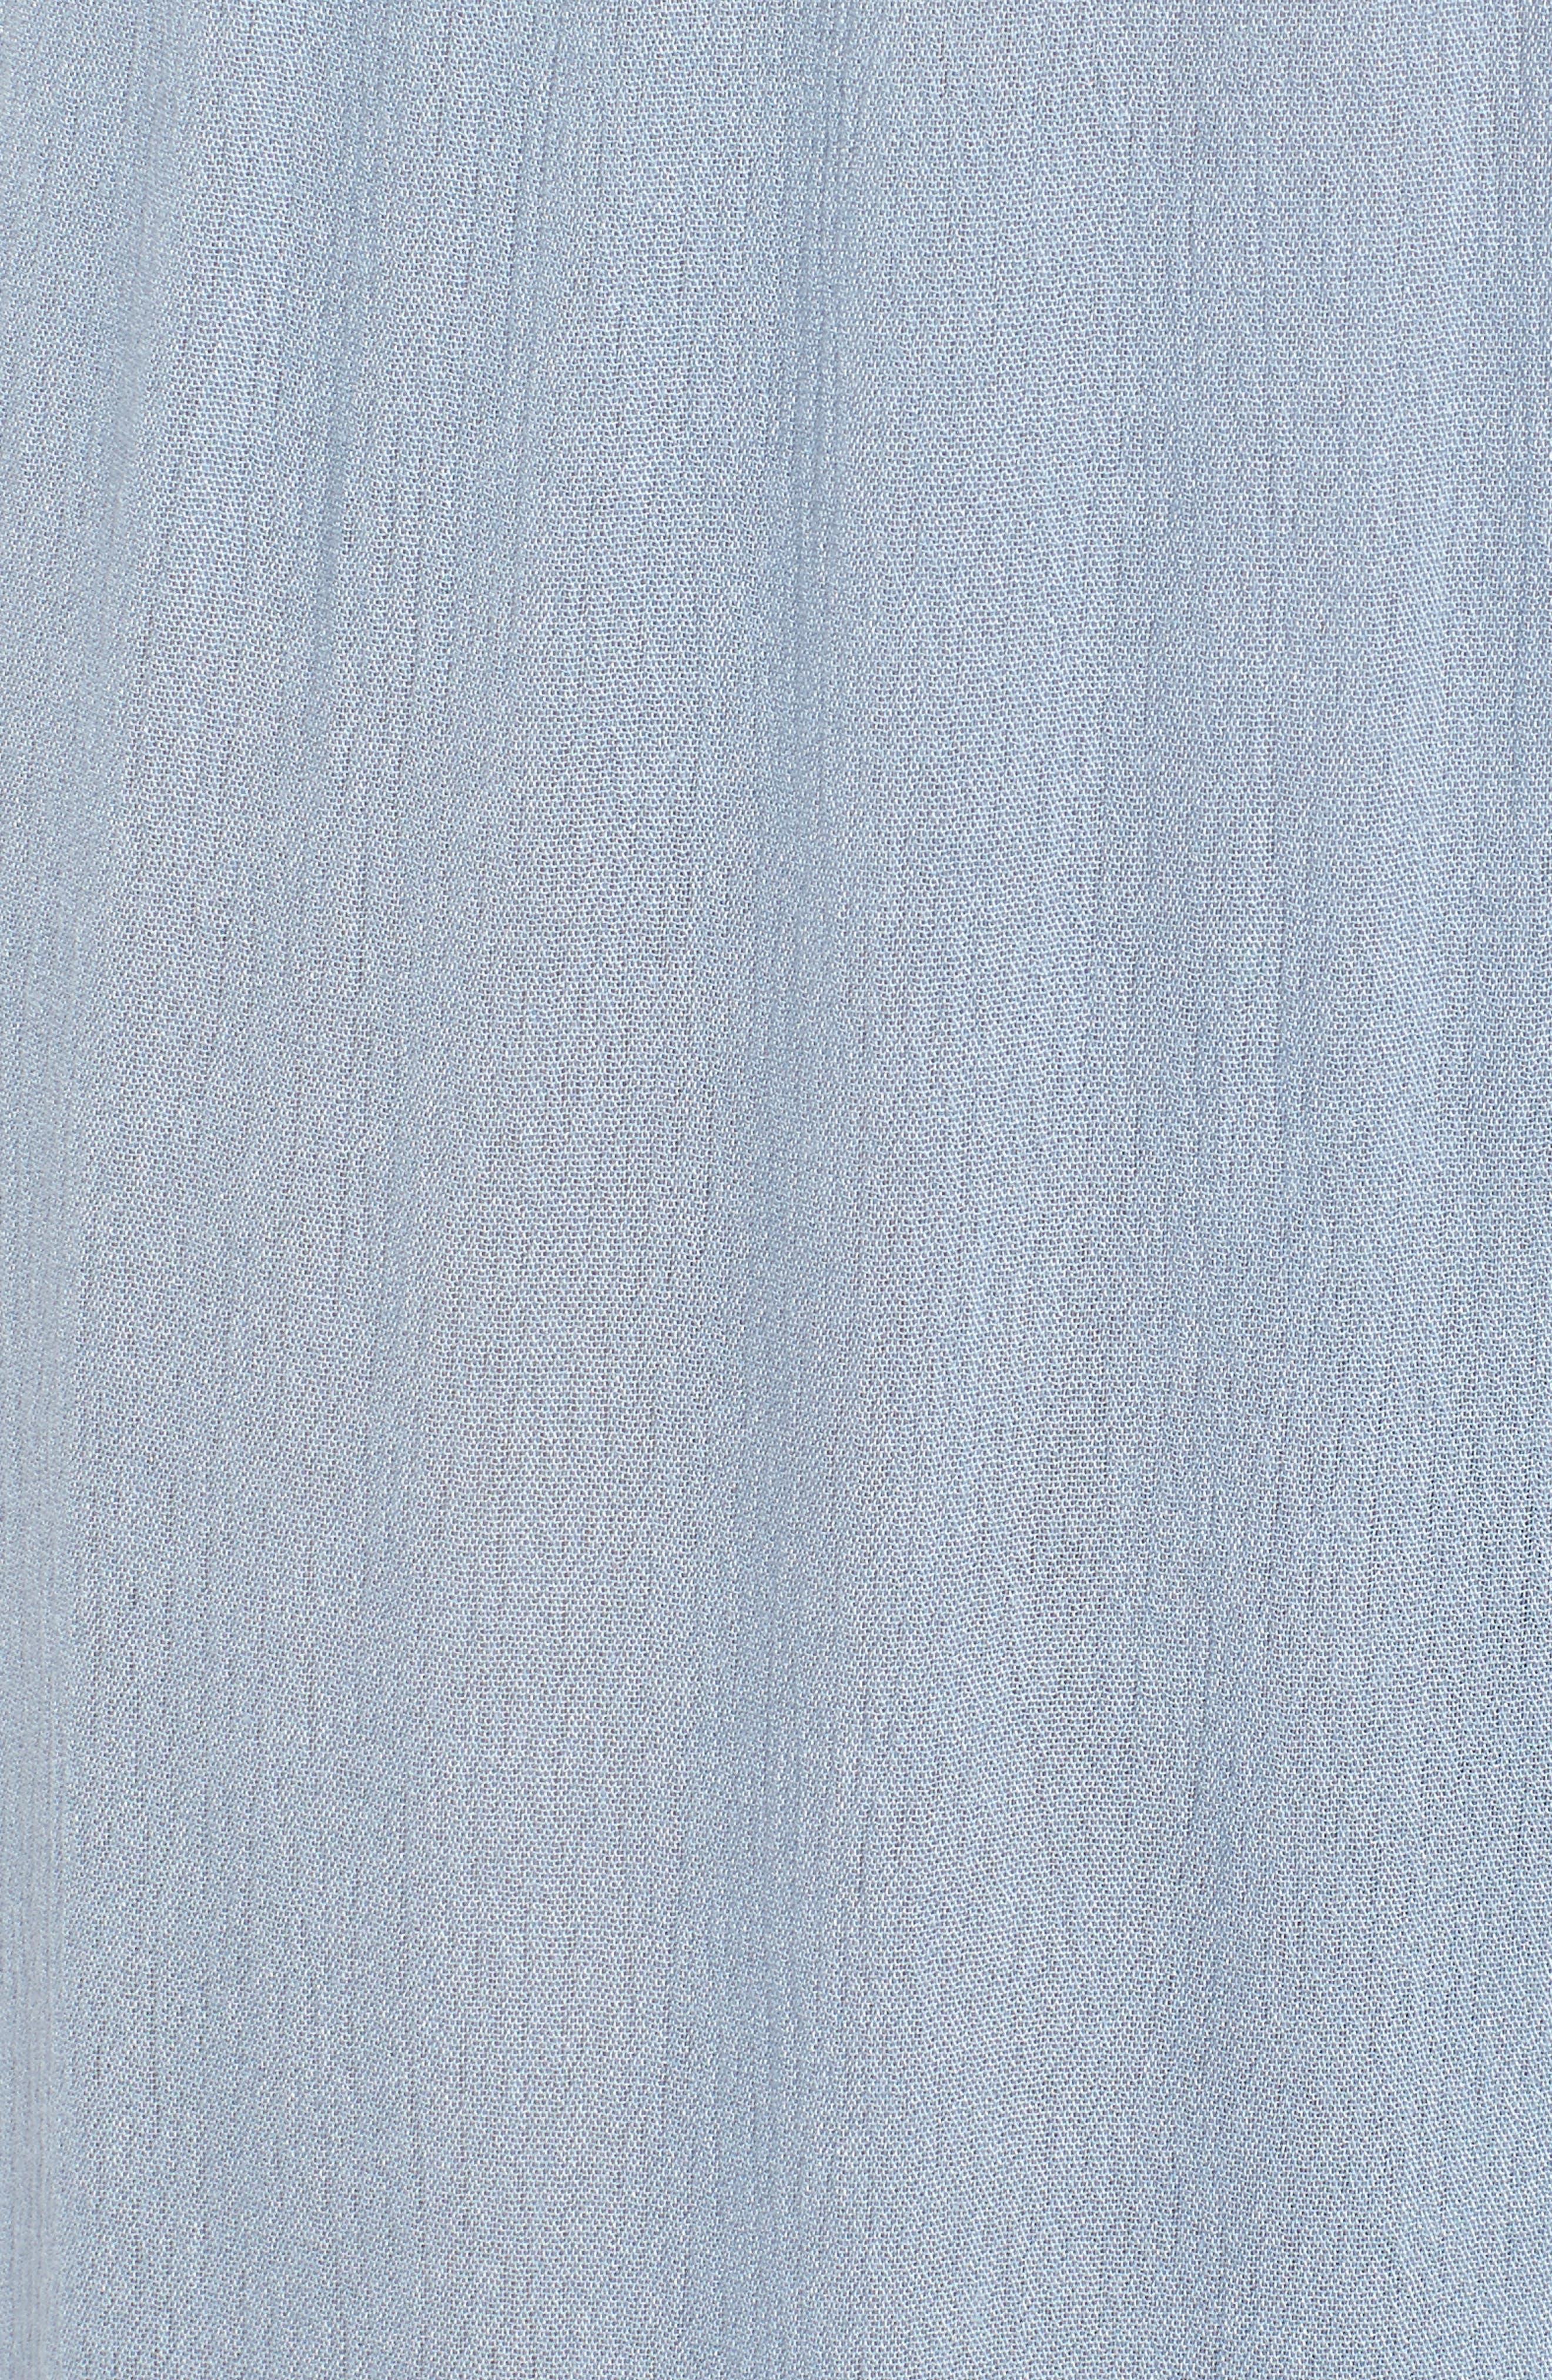 Mystique Ruffle Hem Beach Pants,                             Alternate thumbnail 7, color,                             Blue